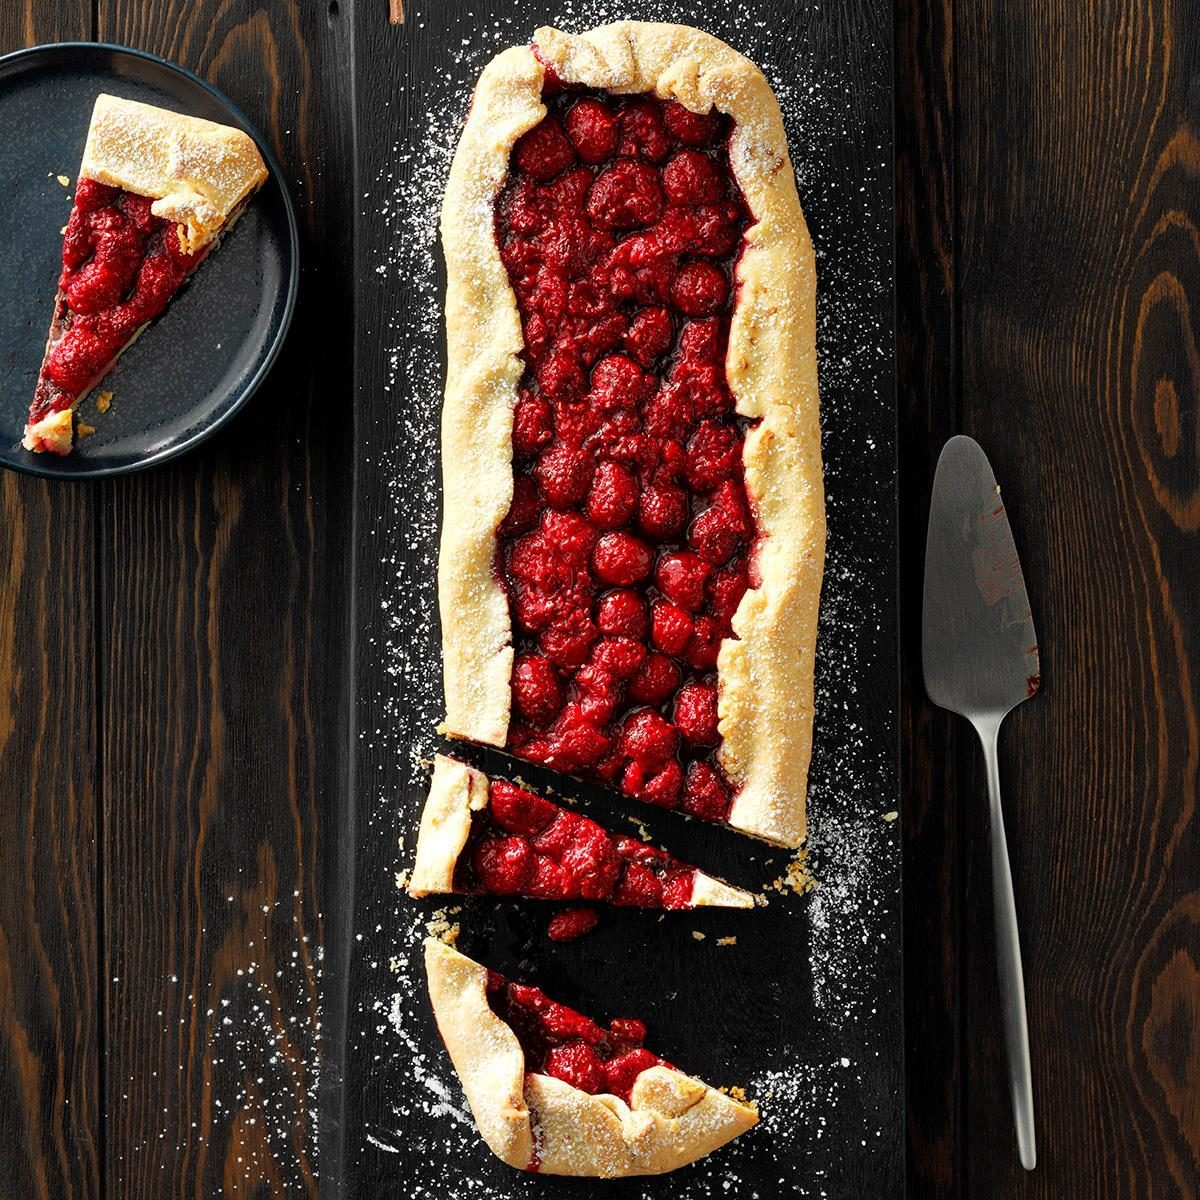 August 11: National Raspberry Tart Day